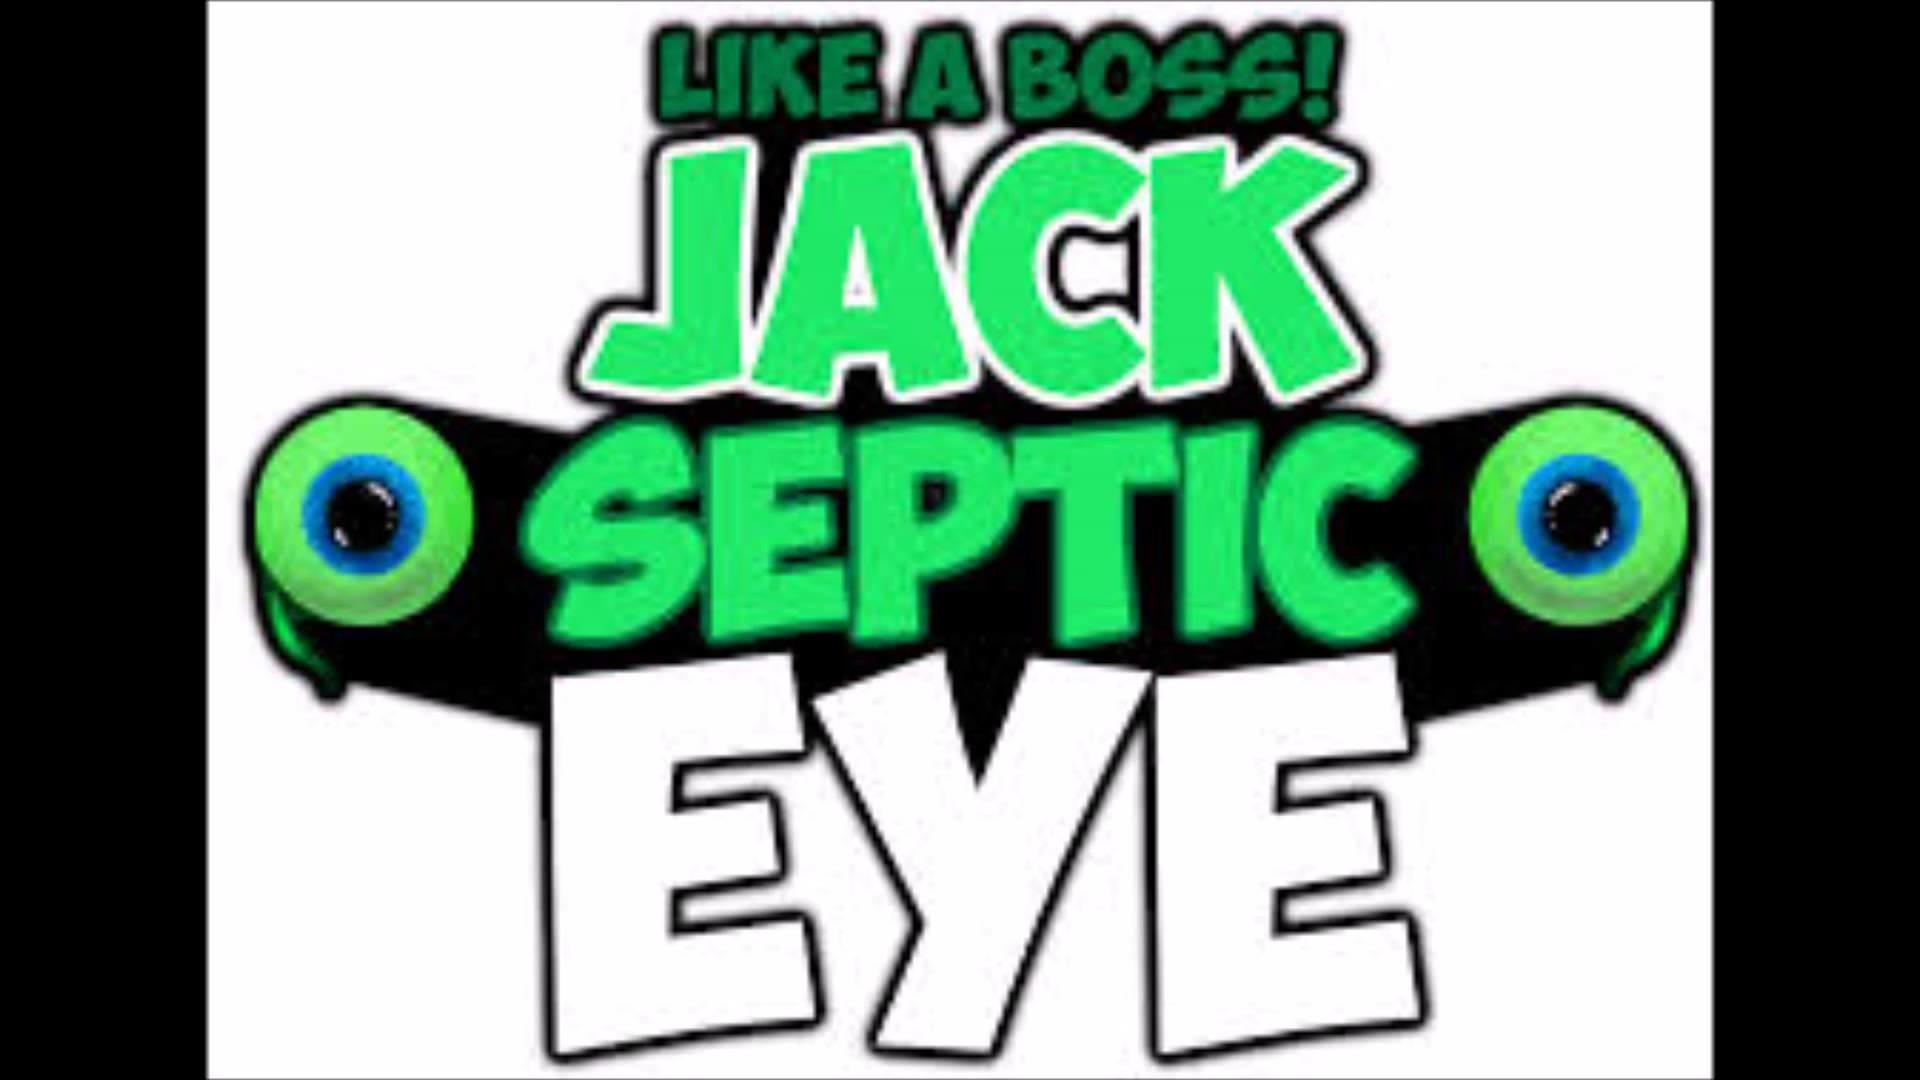 Like a Boss-xXxHAZ3DxXx (Jacksepticeye Fan Song)